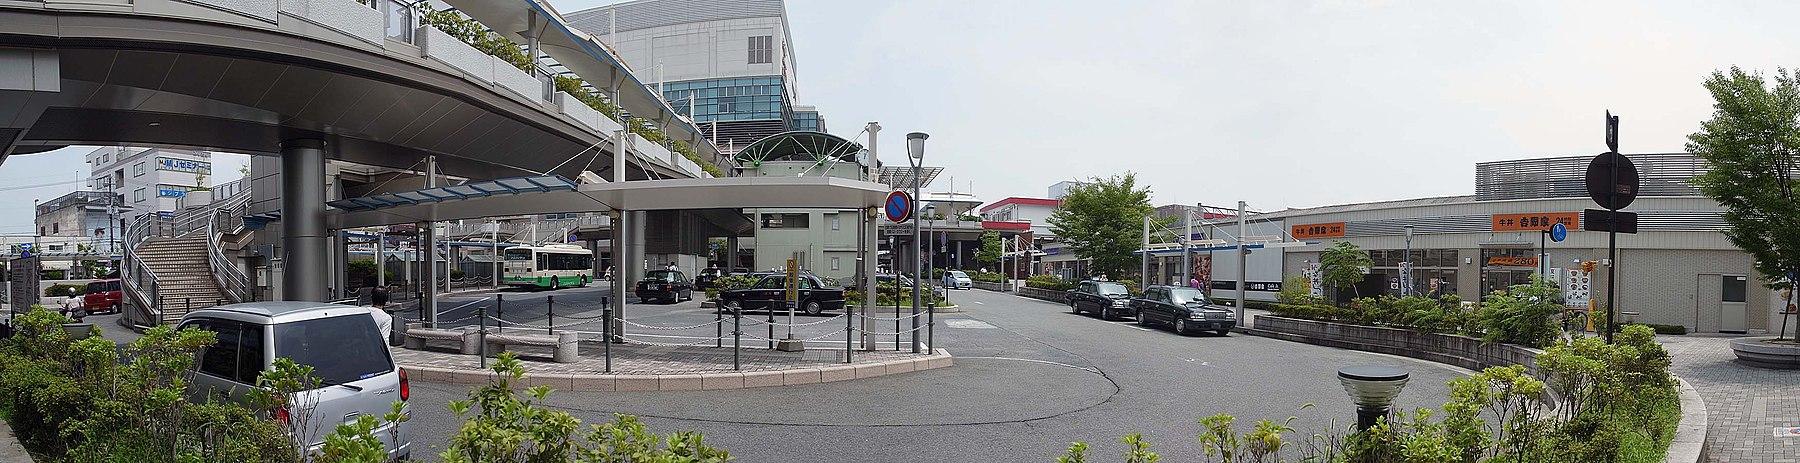 Oji station , 王寺駅 - panoramio.jpg